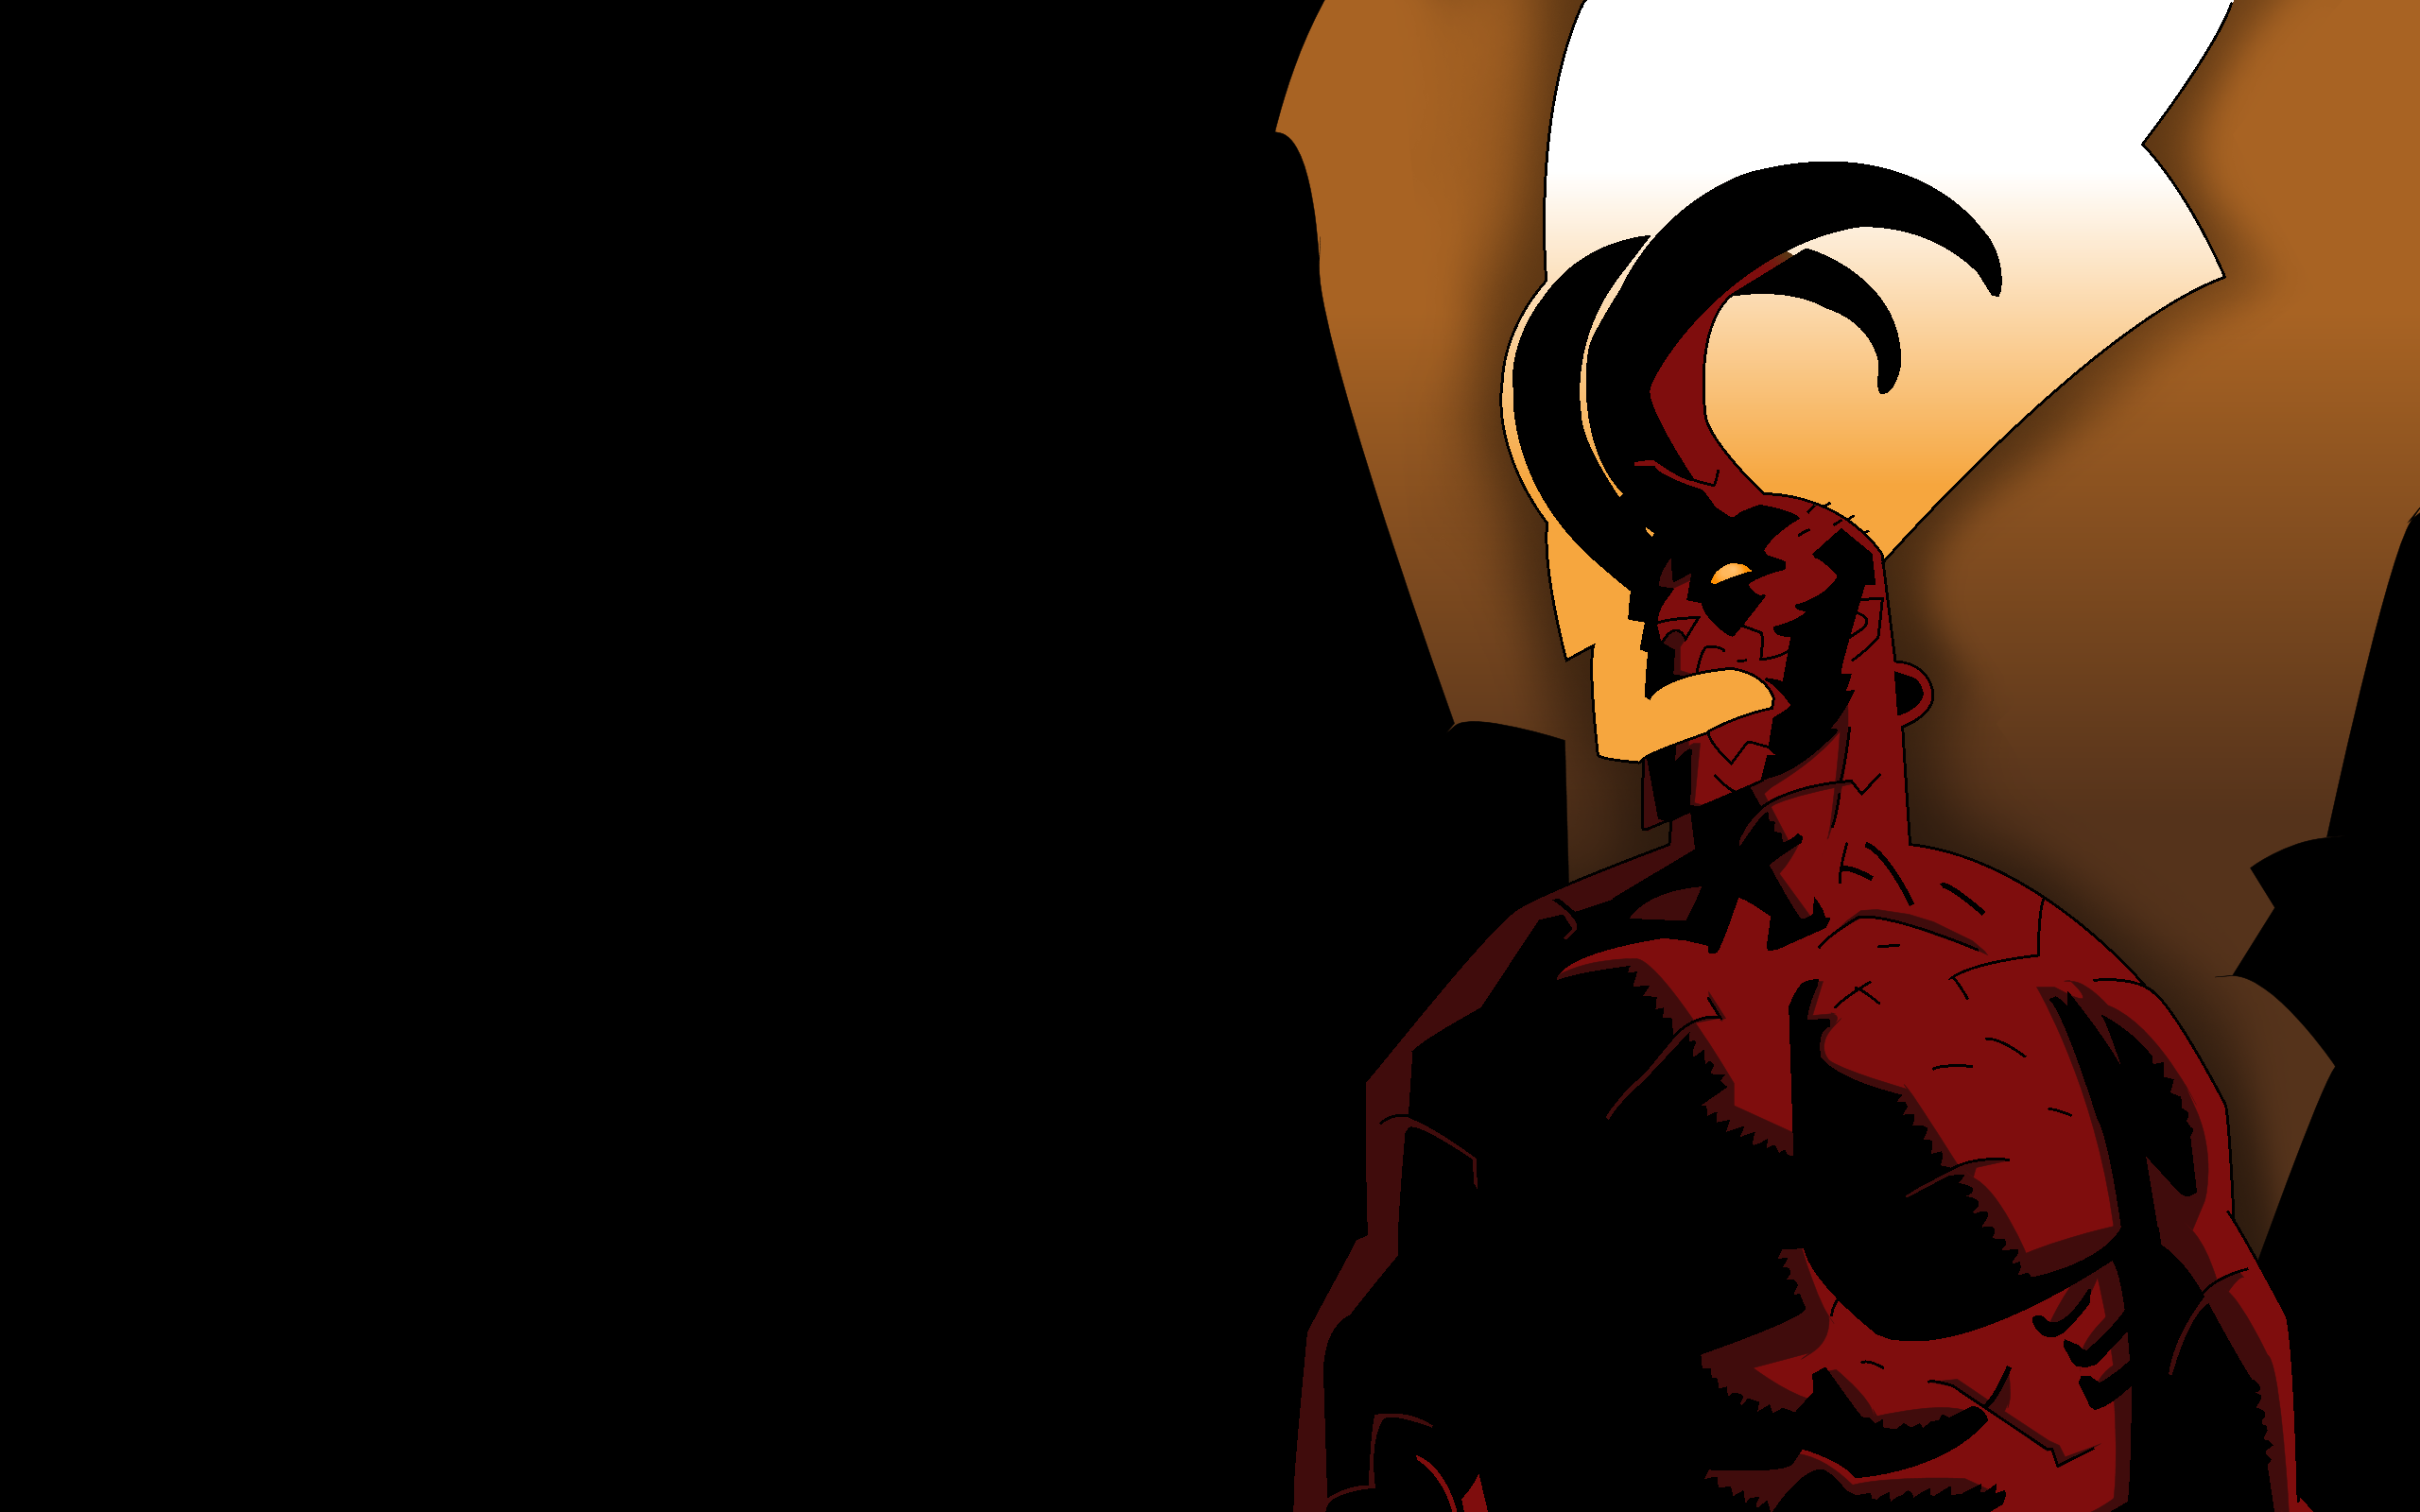 Wake the Devil Hellboy Wallpaper by CameronArt 2560x1600